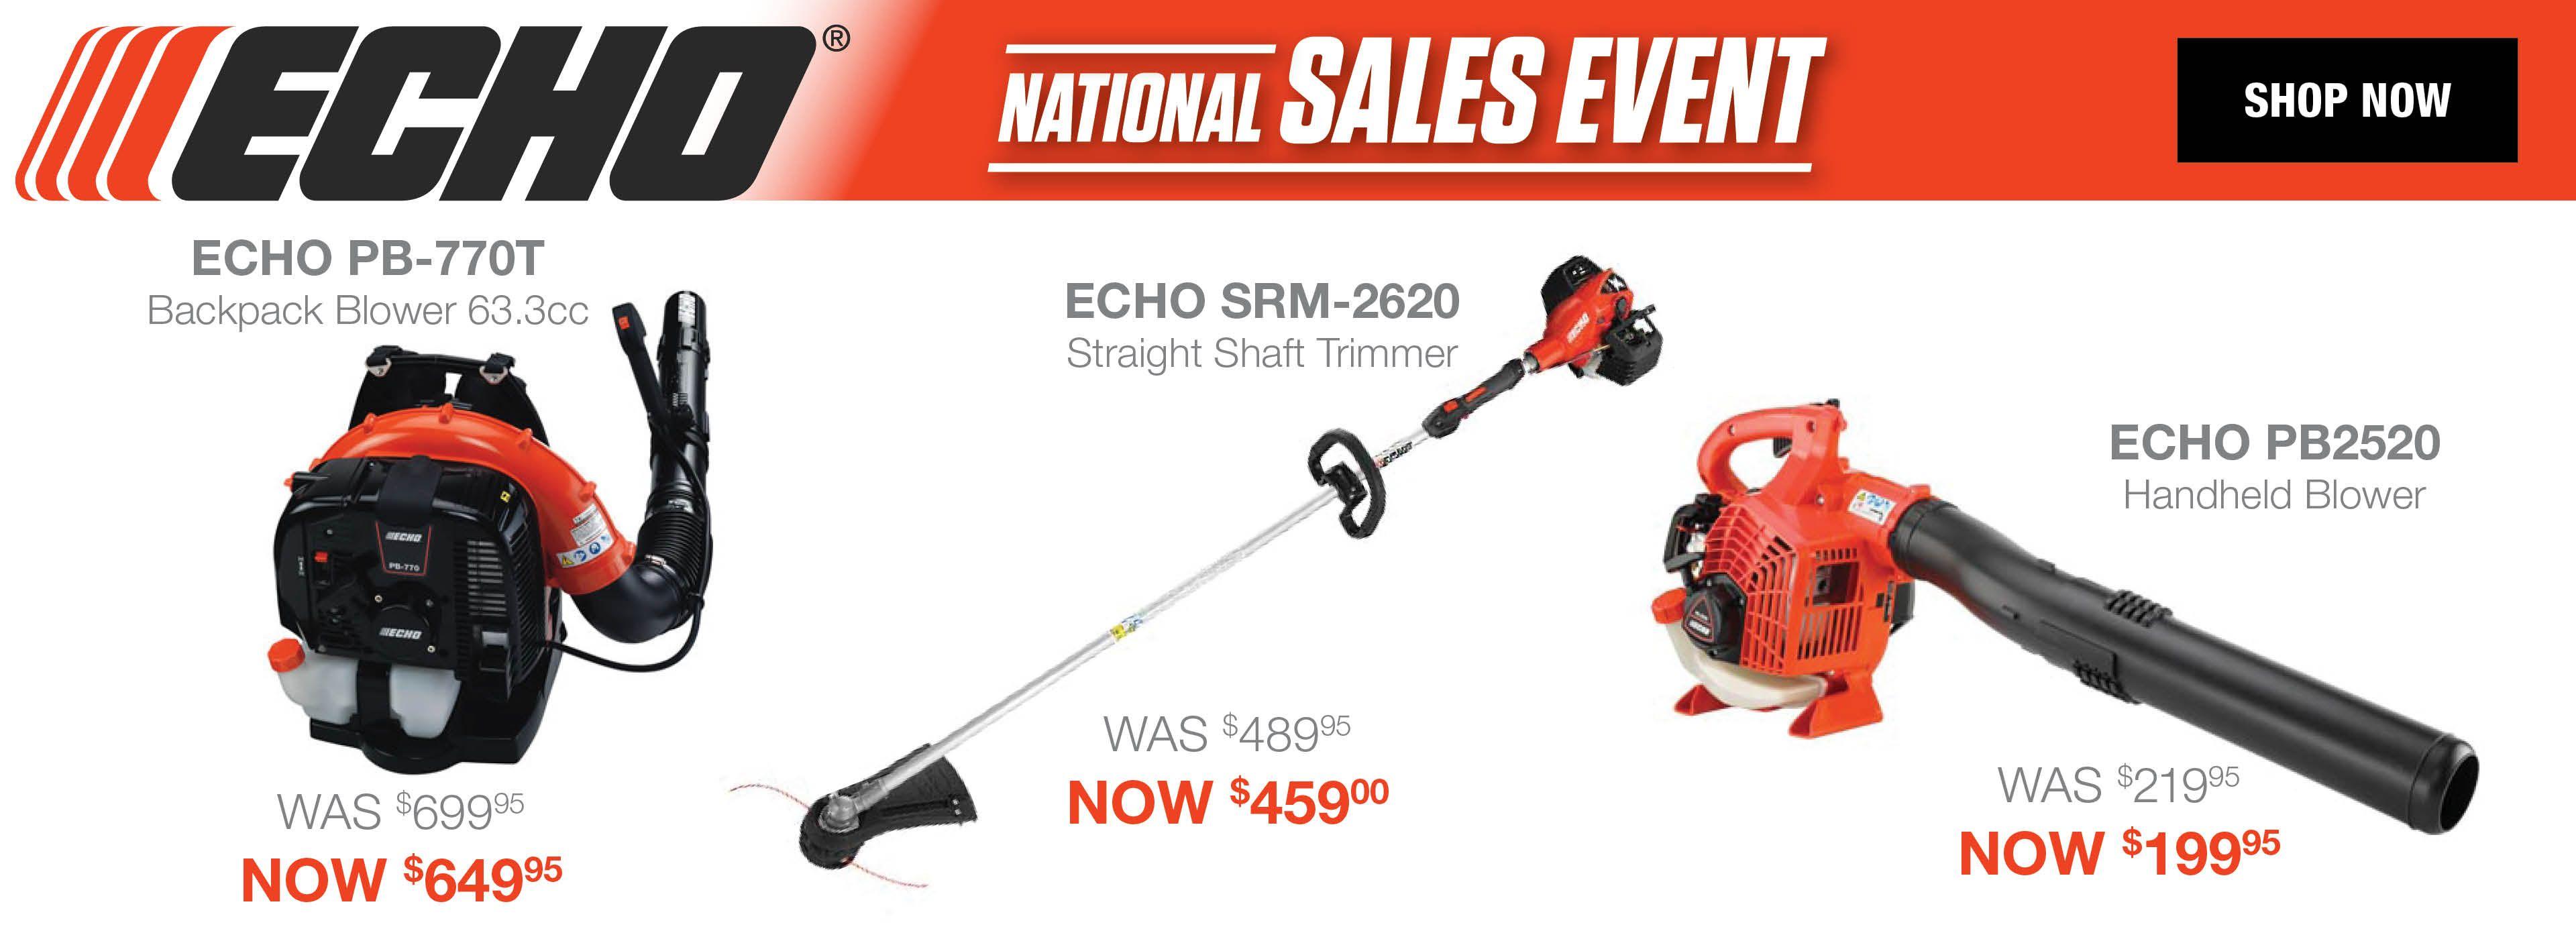 ECHO National Savings Event Spring 2019